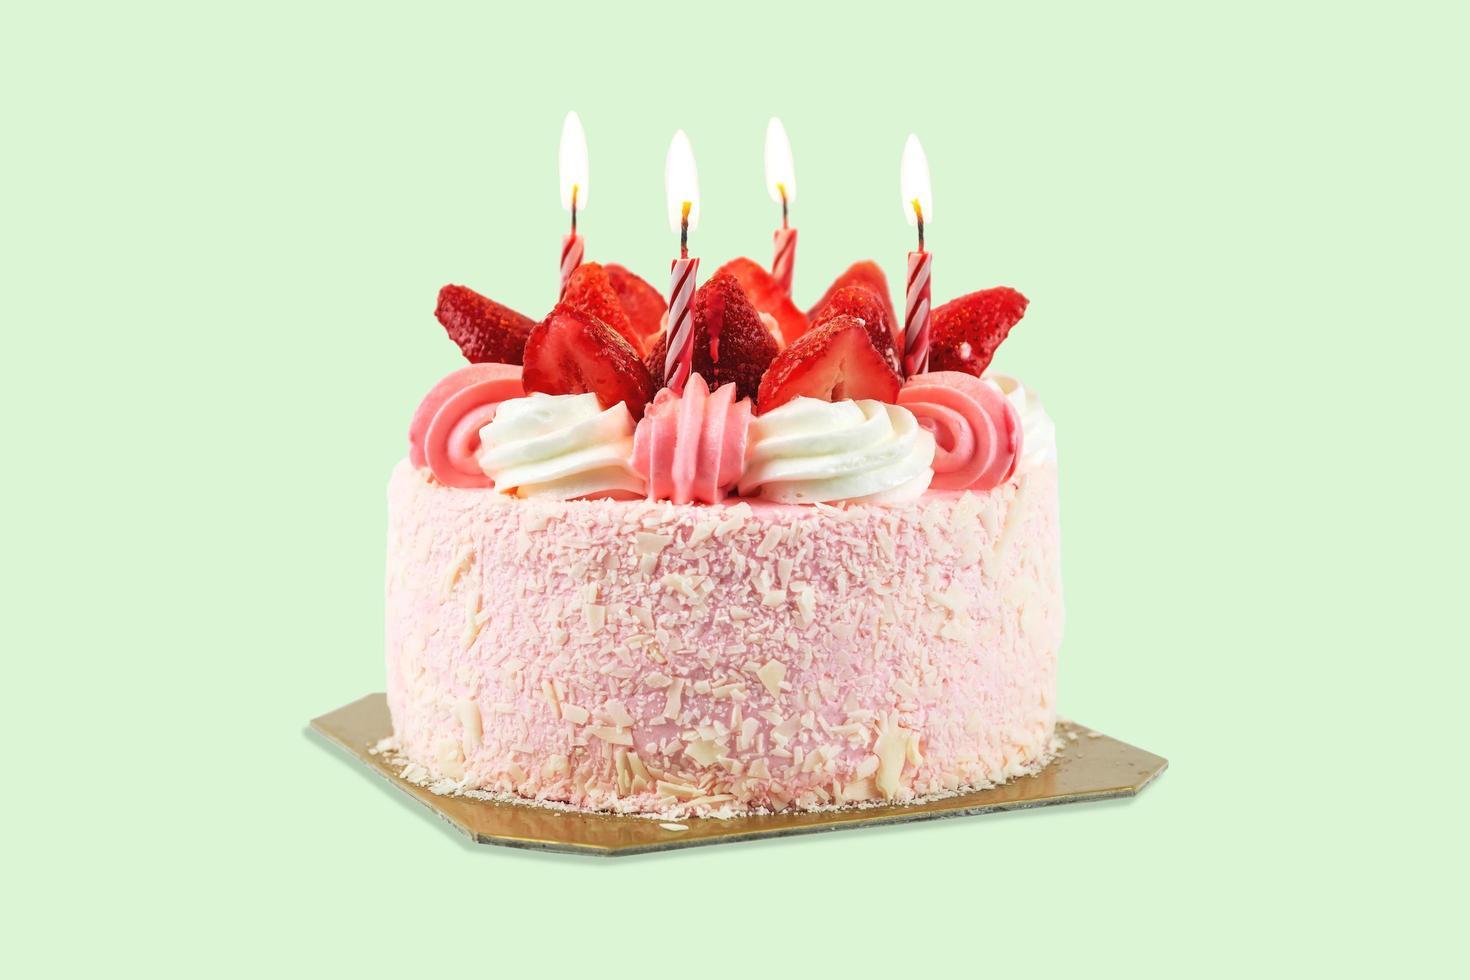 Erdbeer-Geburtstagstorte foto